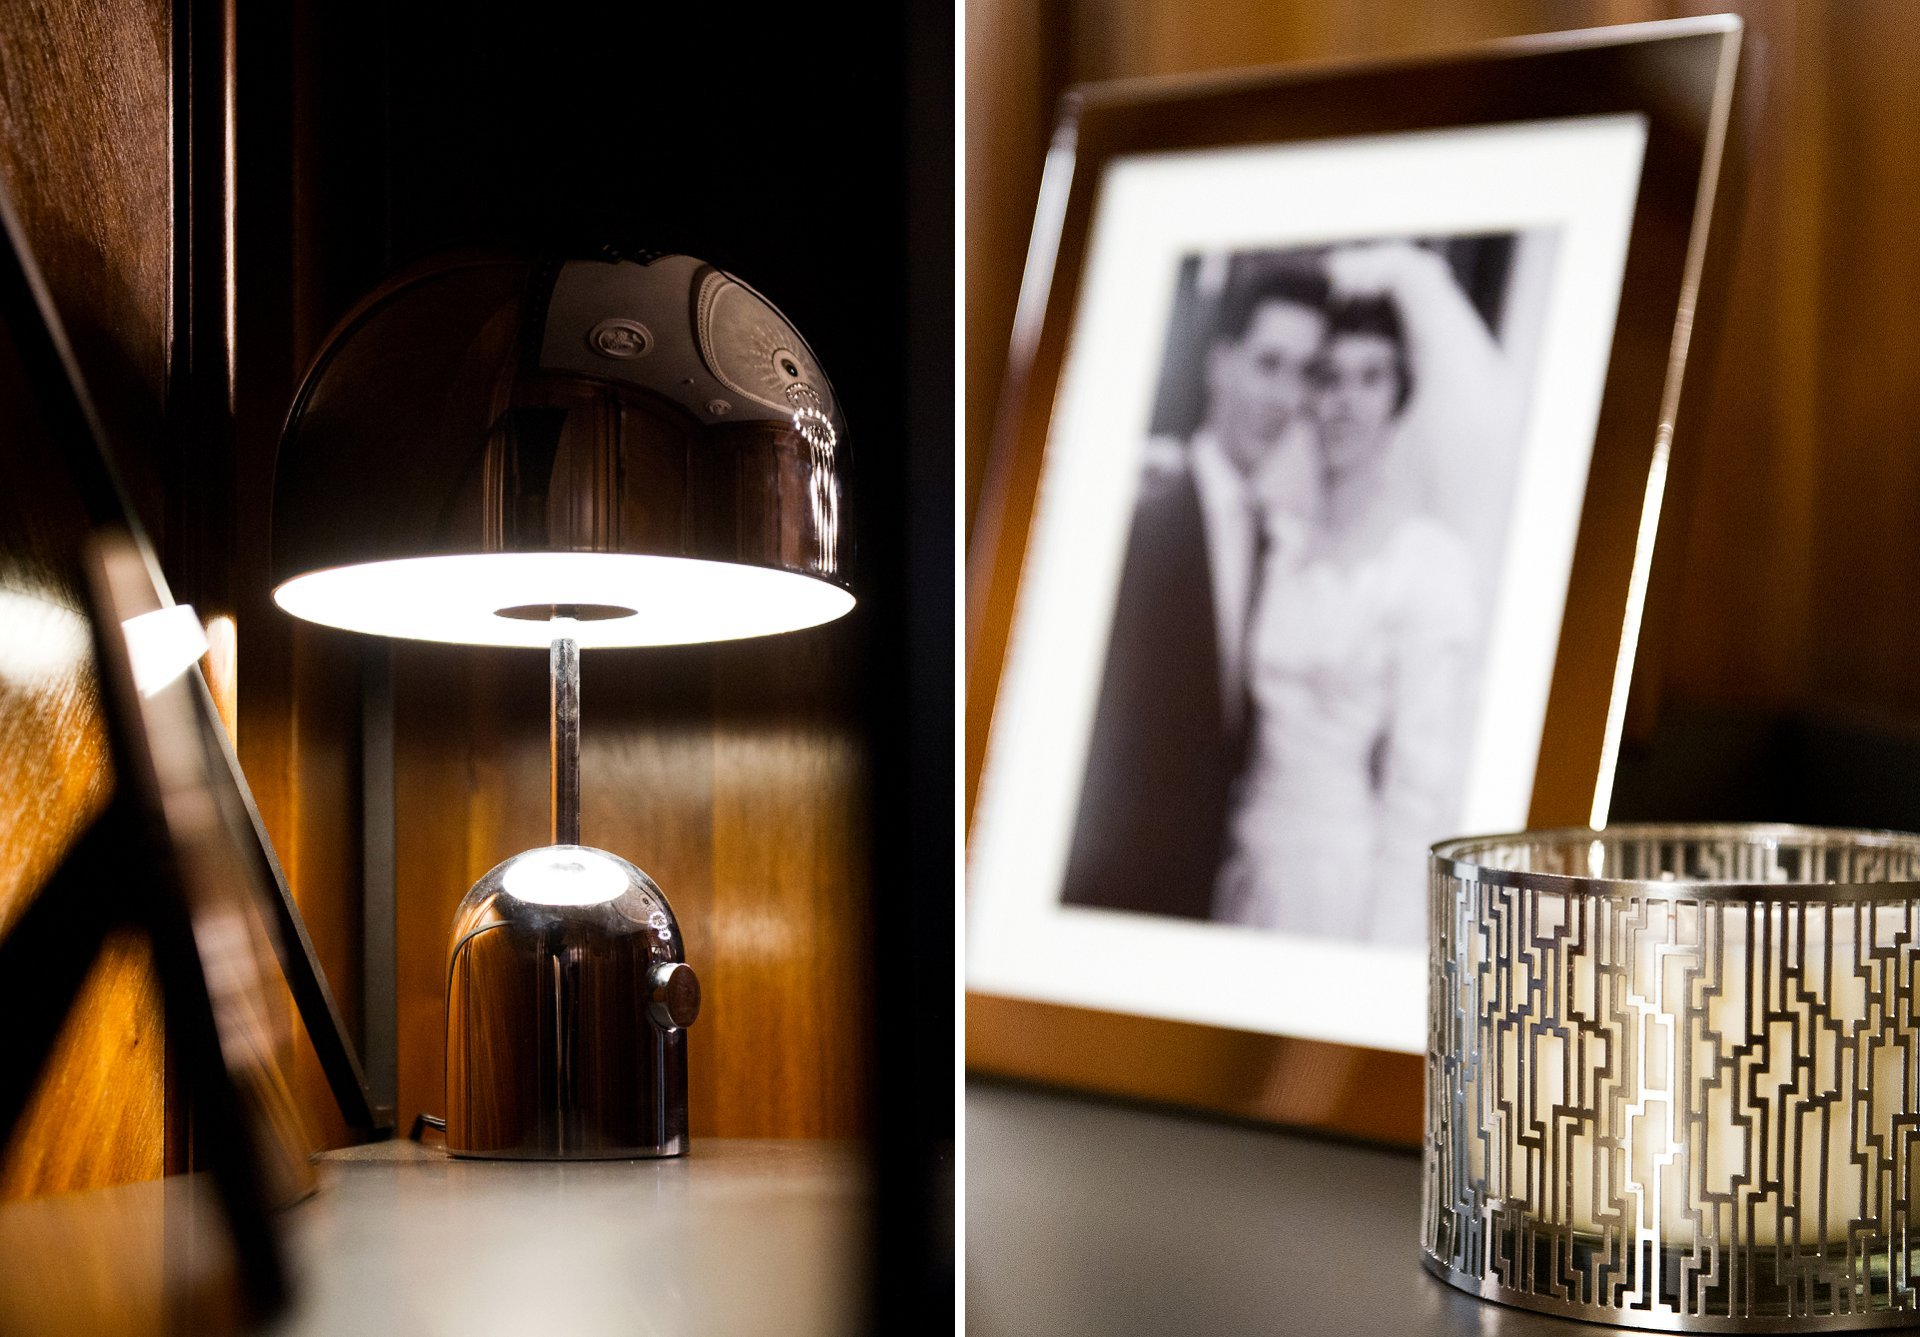 couple-champagne-wedding-day-luxury-romantic-cruise-thames-limo-bespoke-london-charter-houses-of-parliament-big-ben-emma-duggan